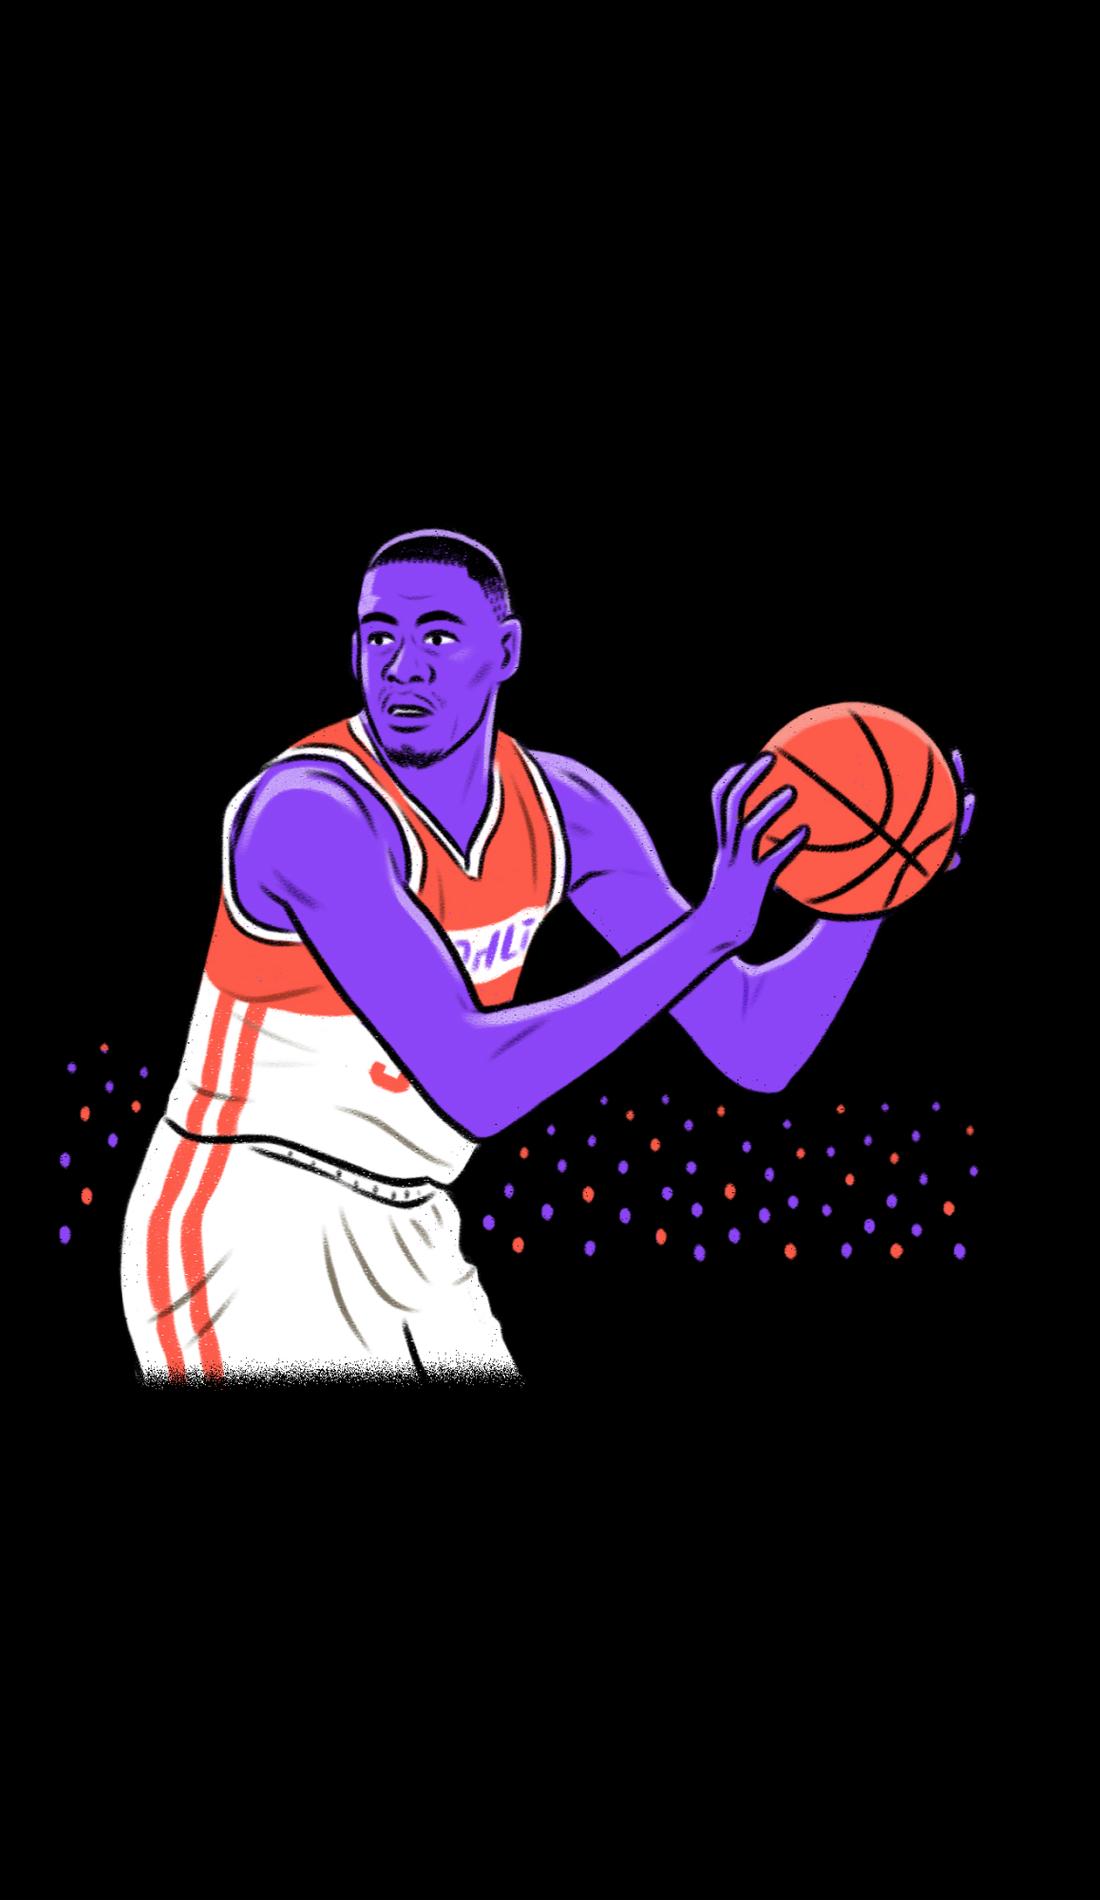 A South Alabama Jaguars Basketball live event